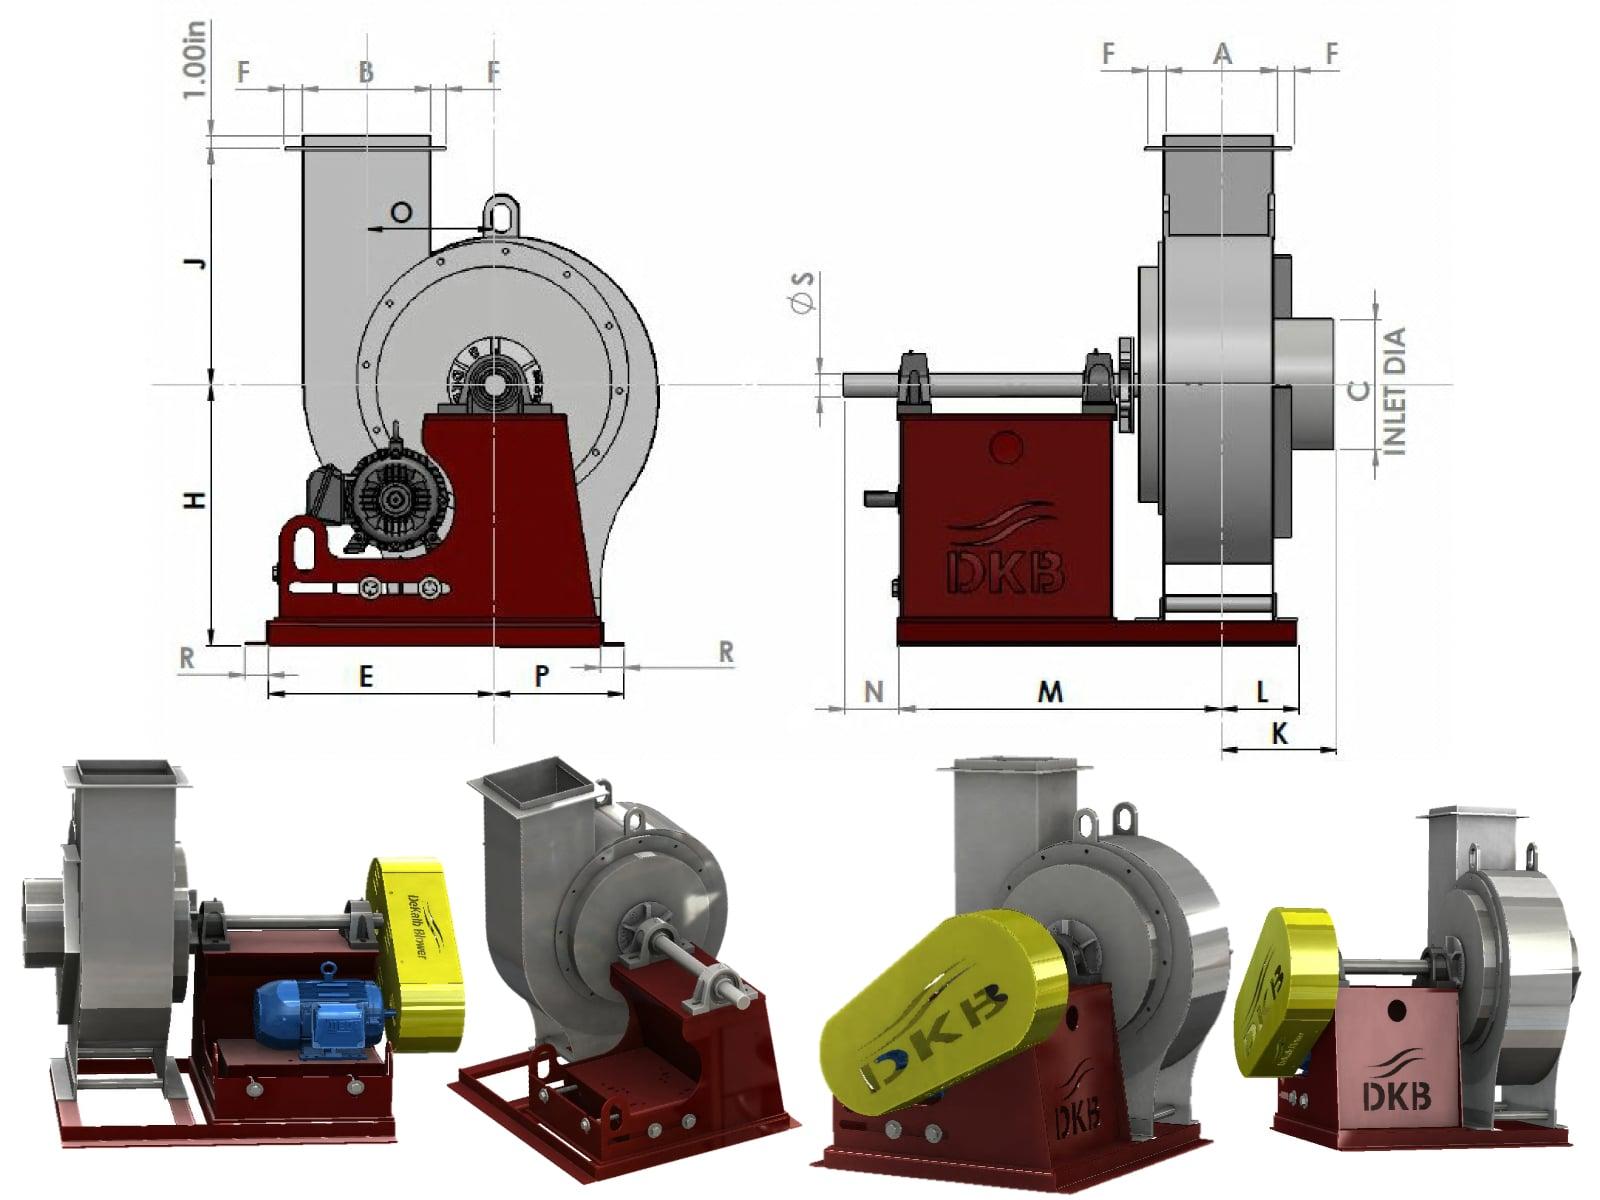 DKB | FHD Un-Insulated Exhaust Assembly